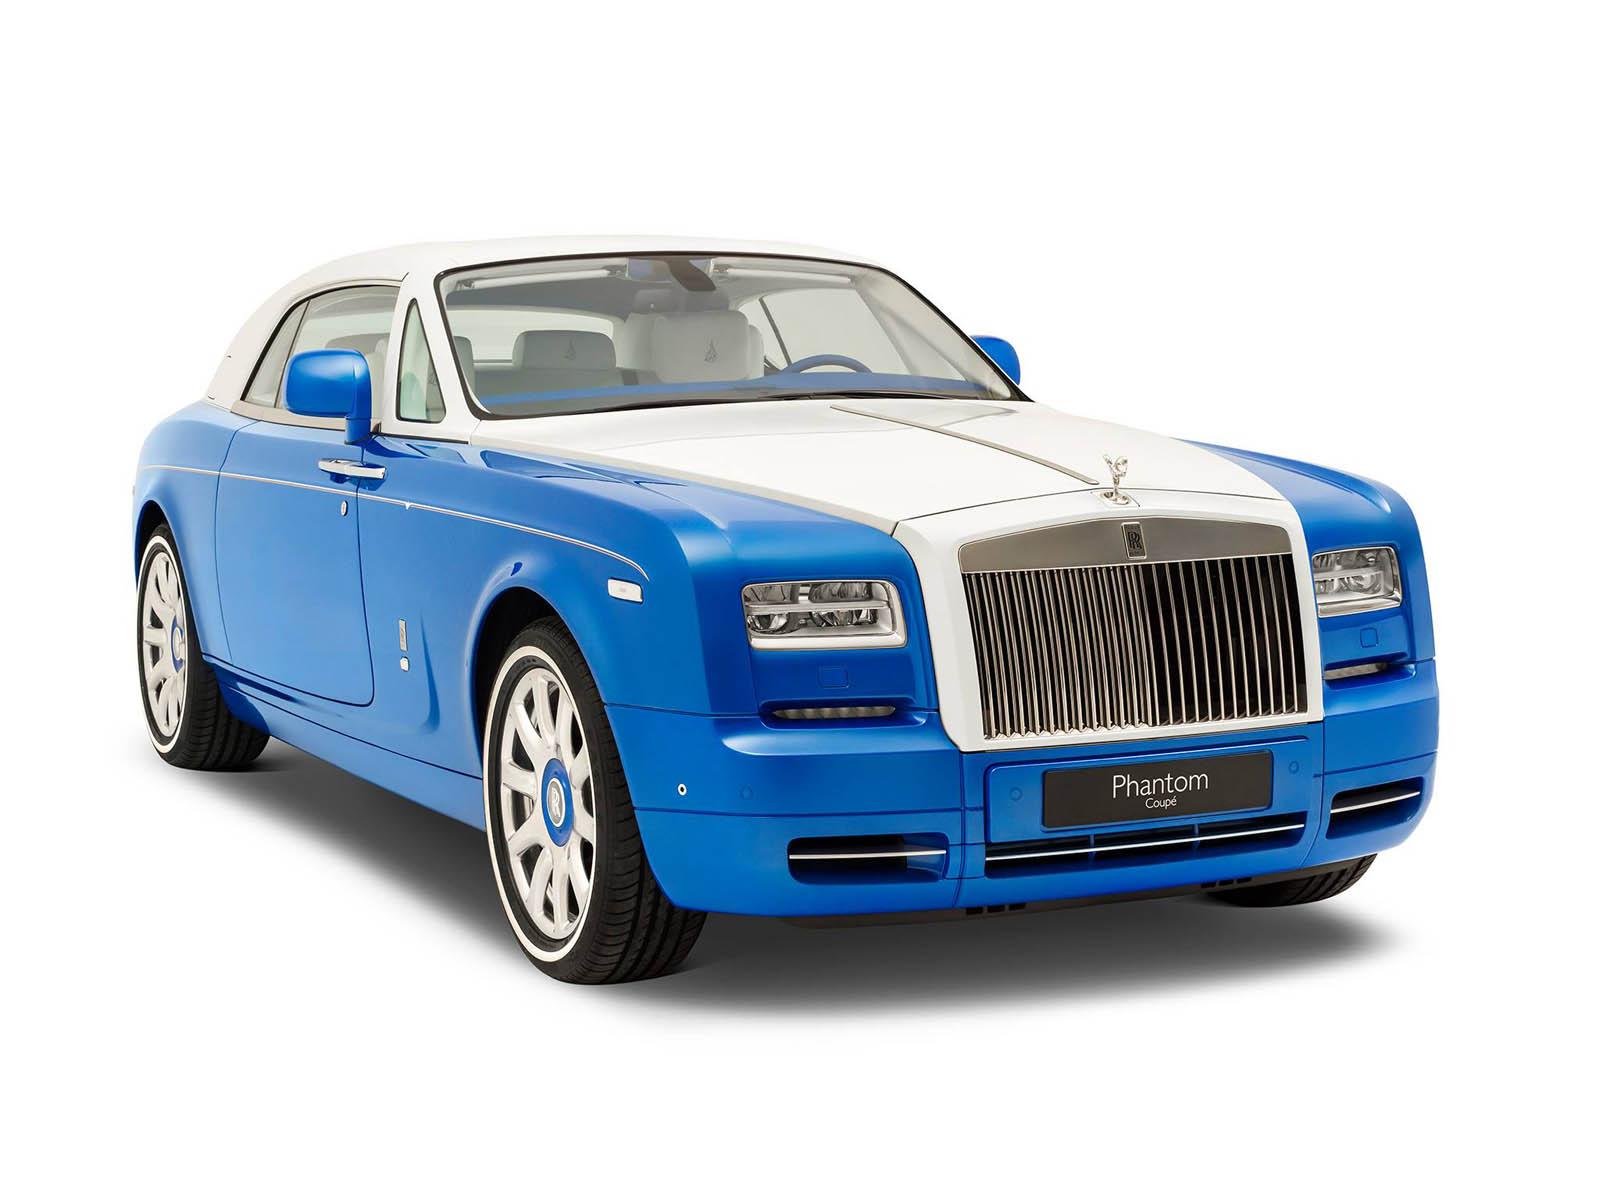 Phantom Coupe inspired by Qasr Al Hosn